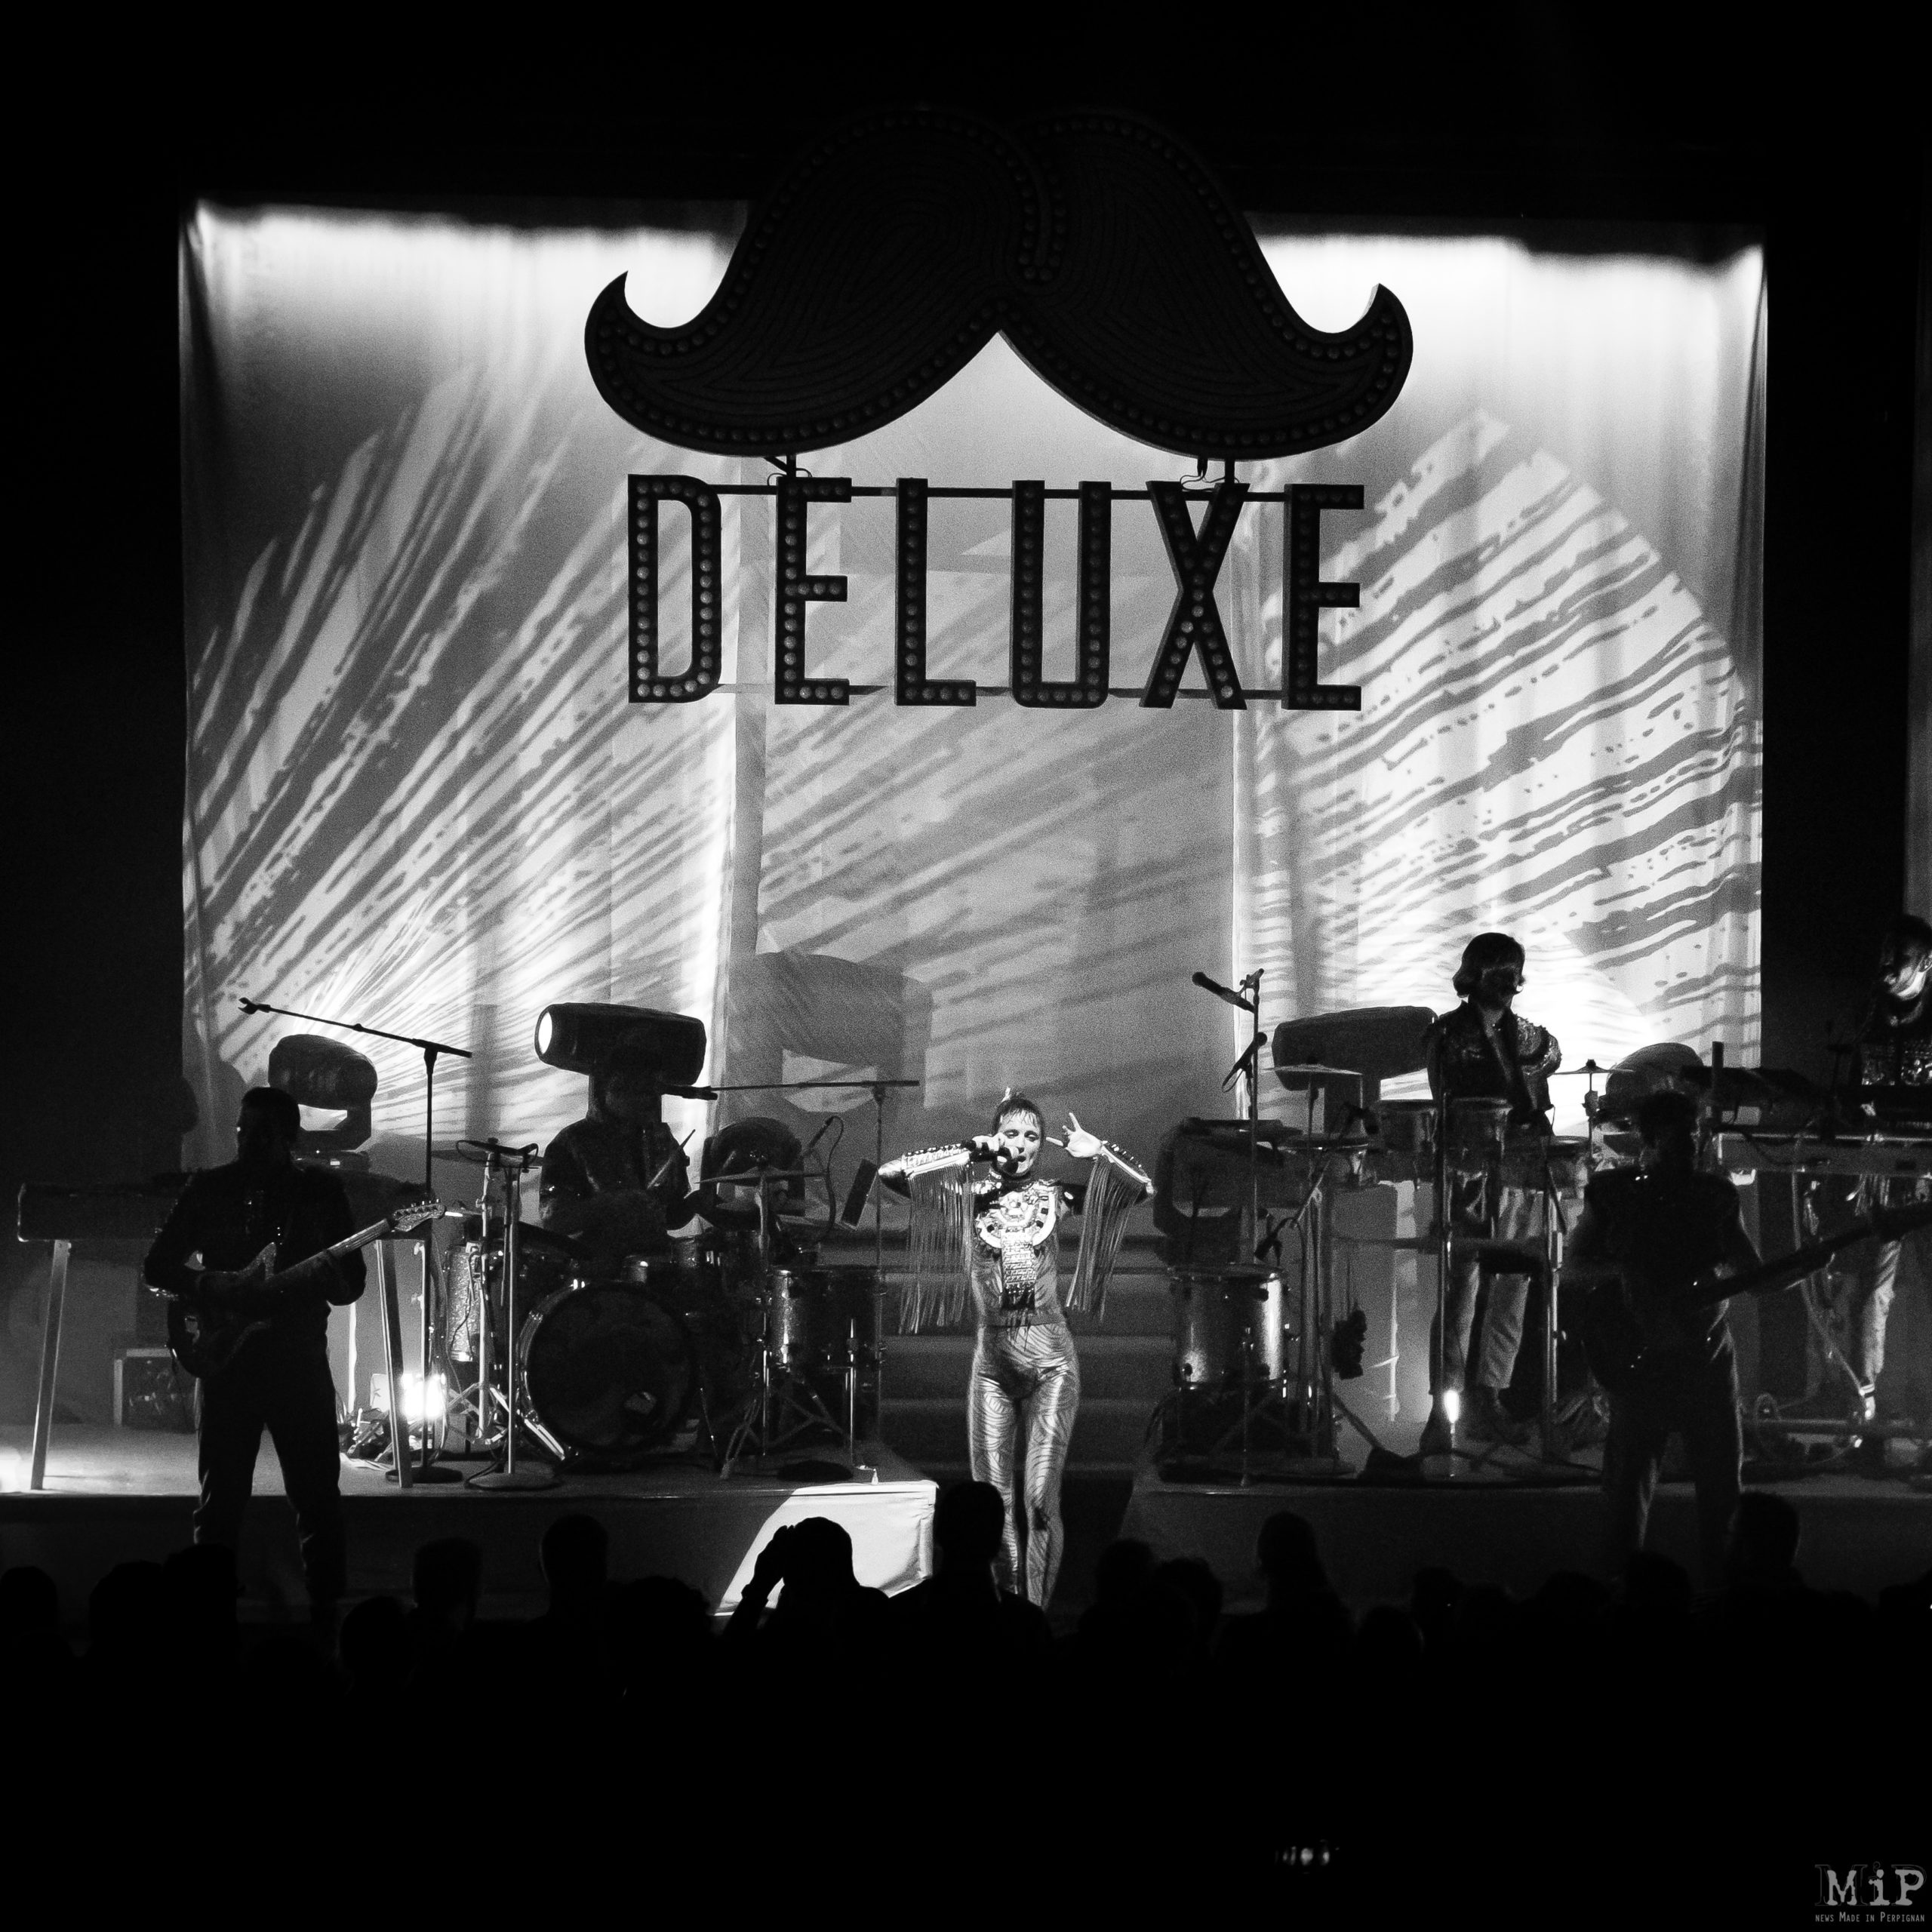 Perpignan, France, Deluxe Concert El Mediator Tournée Boys and Girl 2019 © Arnaud Le Vu / MiP / APM